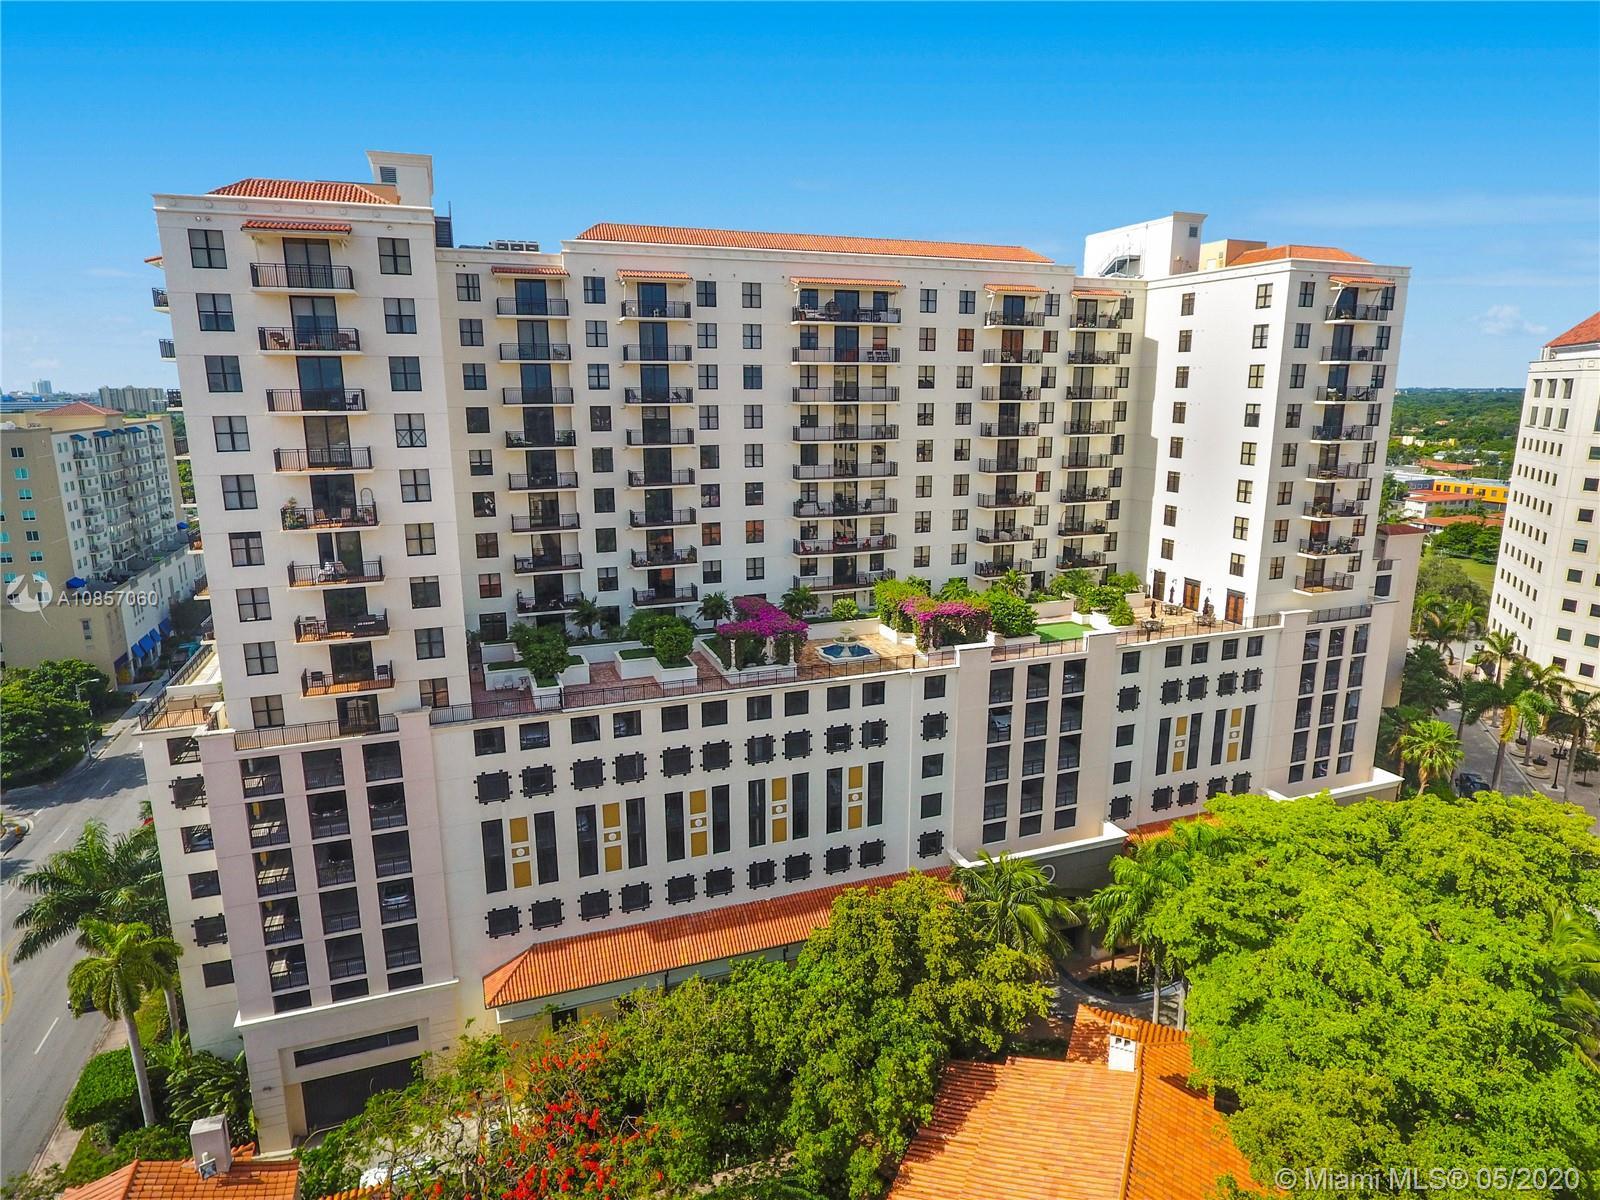 888 S Douglas Rd # 1515, Coral Gables, Florida 33134, 2 Bedrooms Bedrooms, ,2 BathroomsBathrooms,Residential,For Sale,888 S Douglas Rd # 1515,A10857060